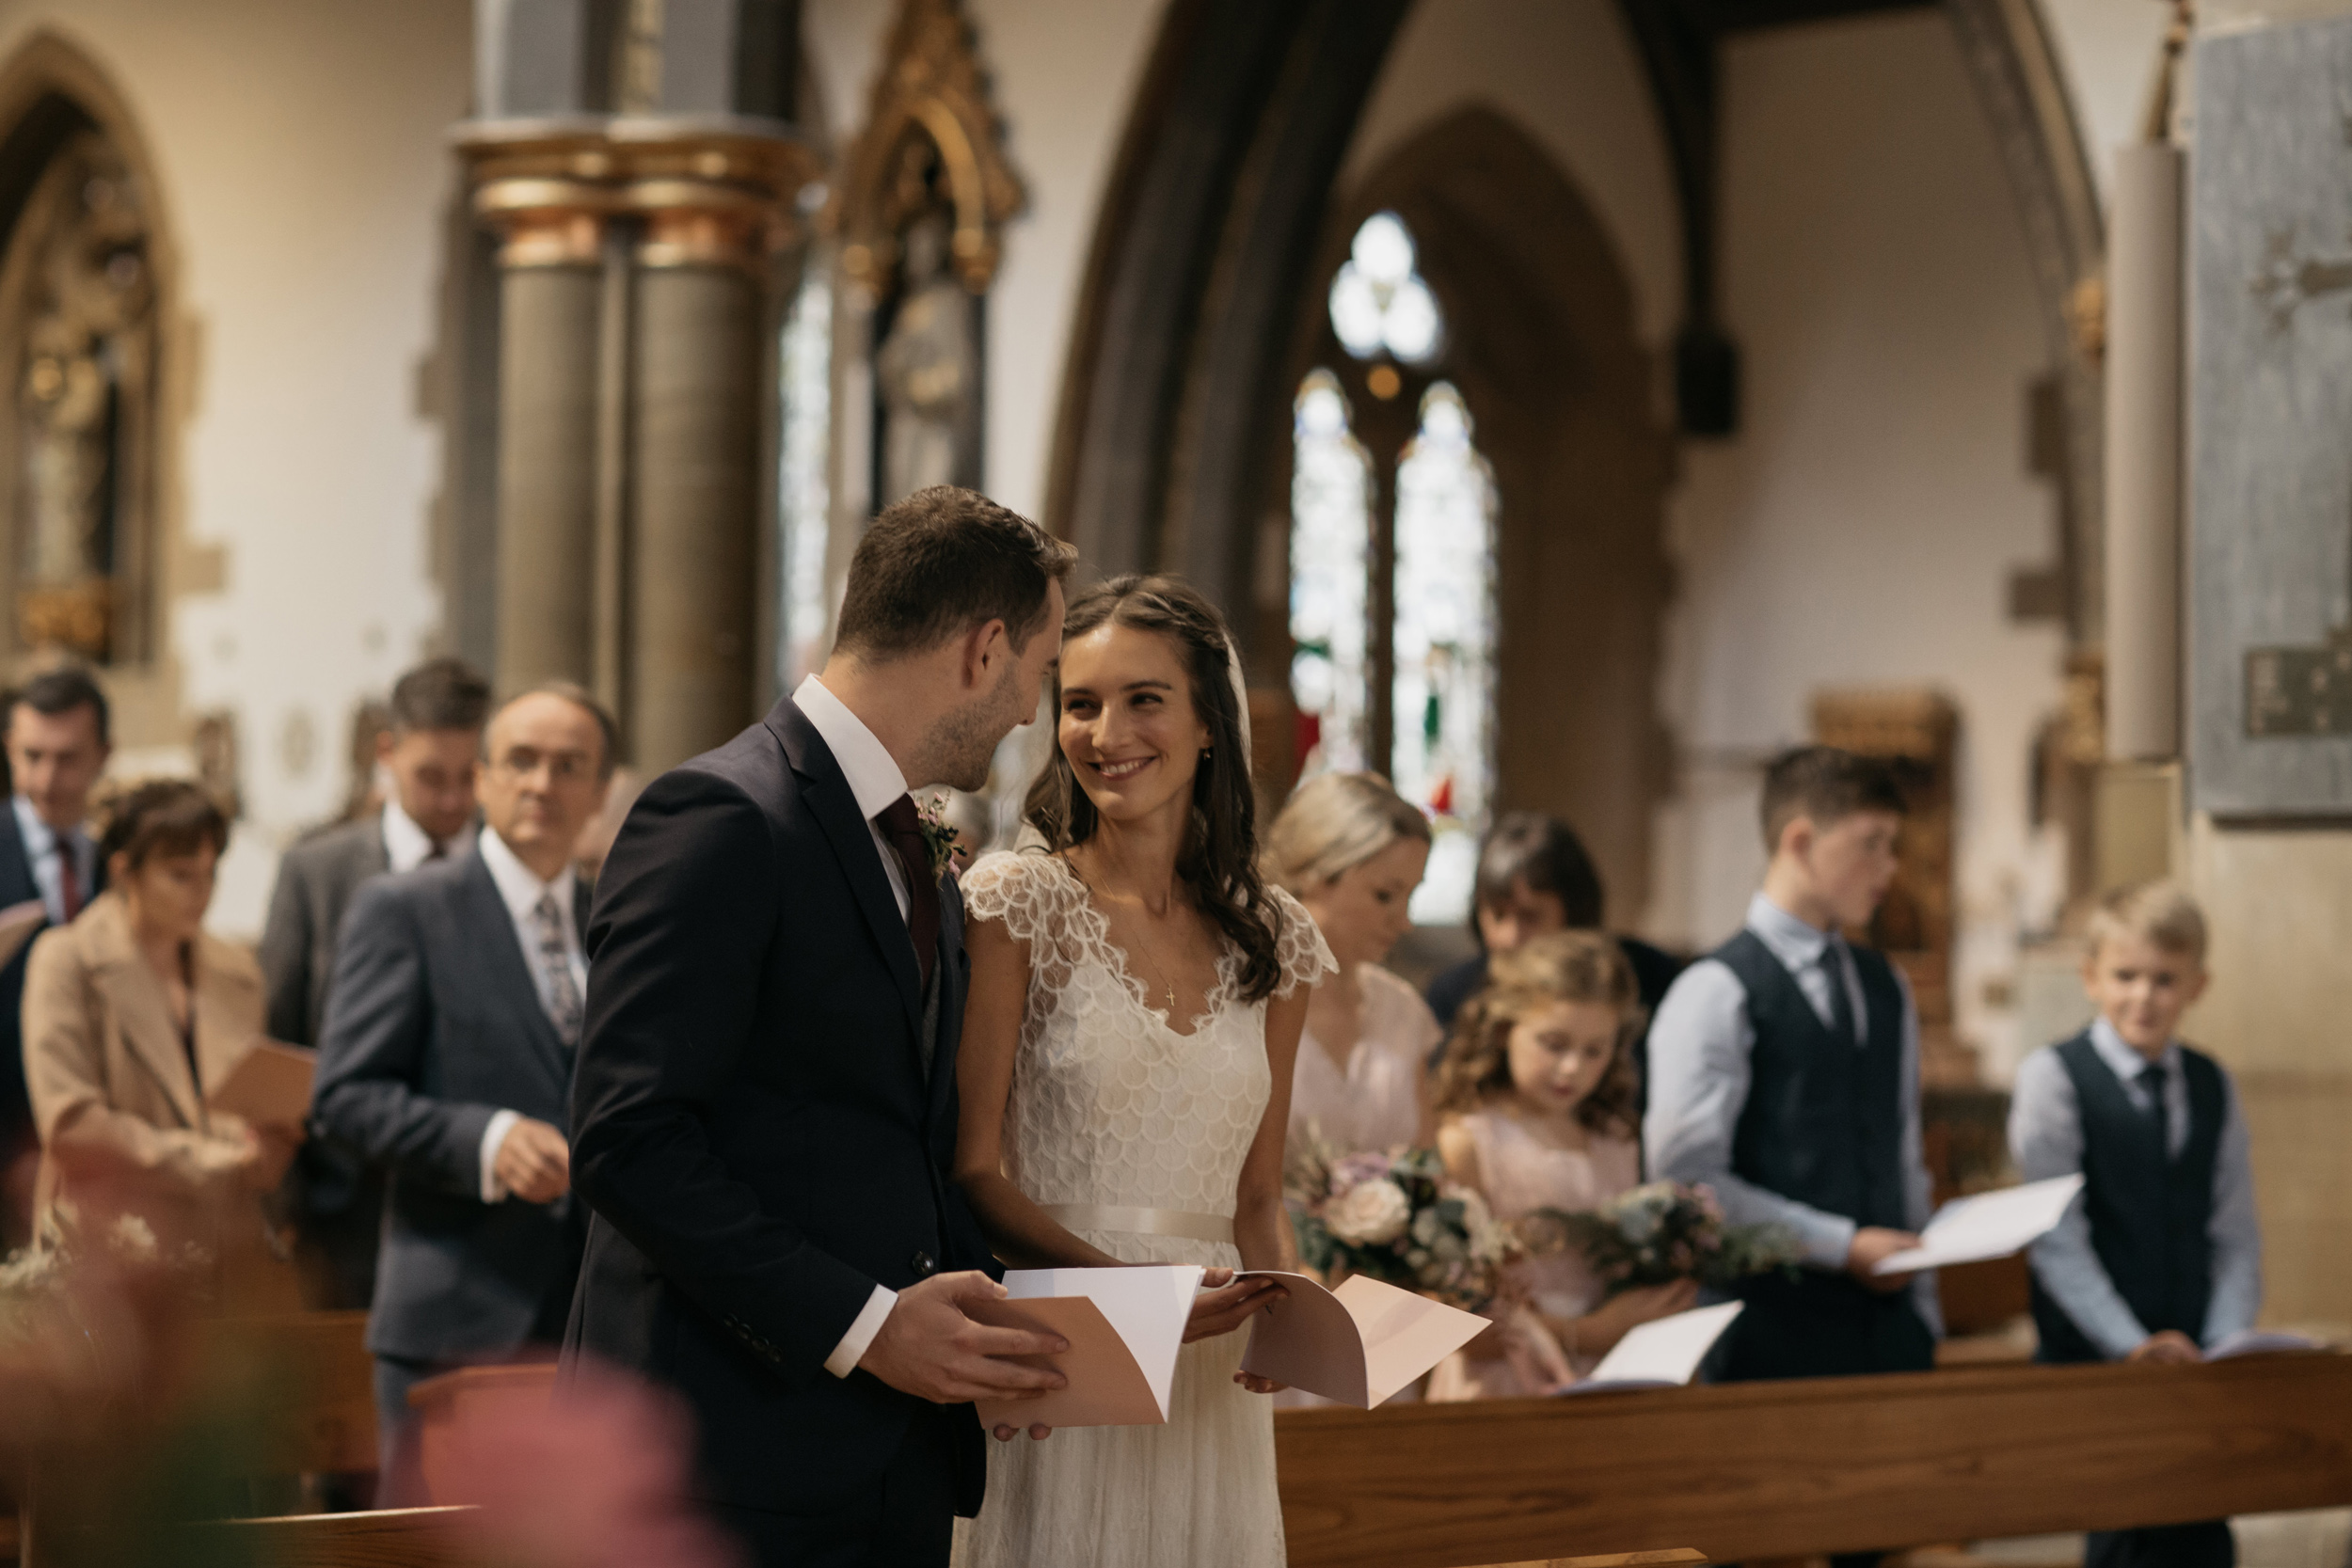 Joasia-Kate-Beaumont-Bohemian-Lace-Wedding-Dress-Peak-District-Sheffield-Wedding-8.jpg